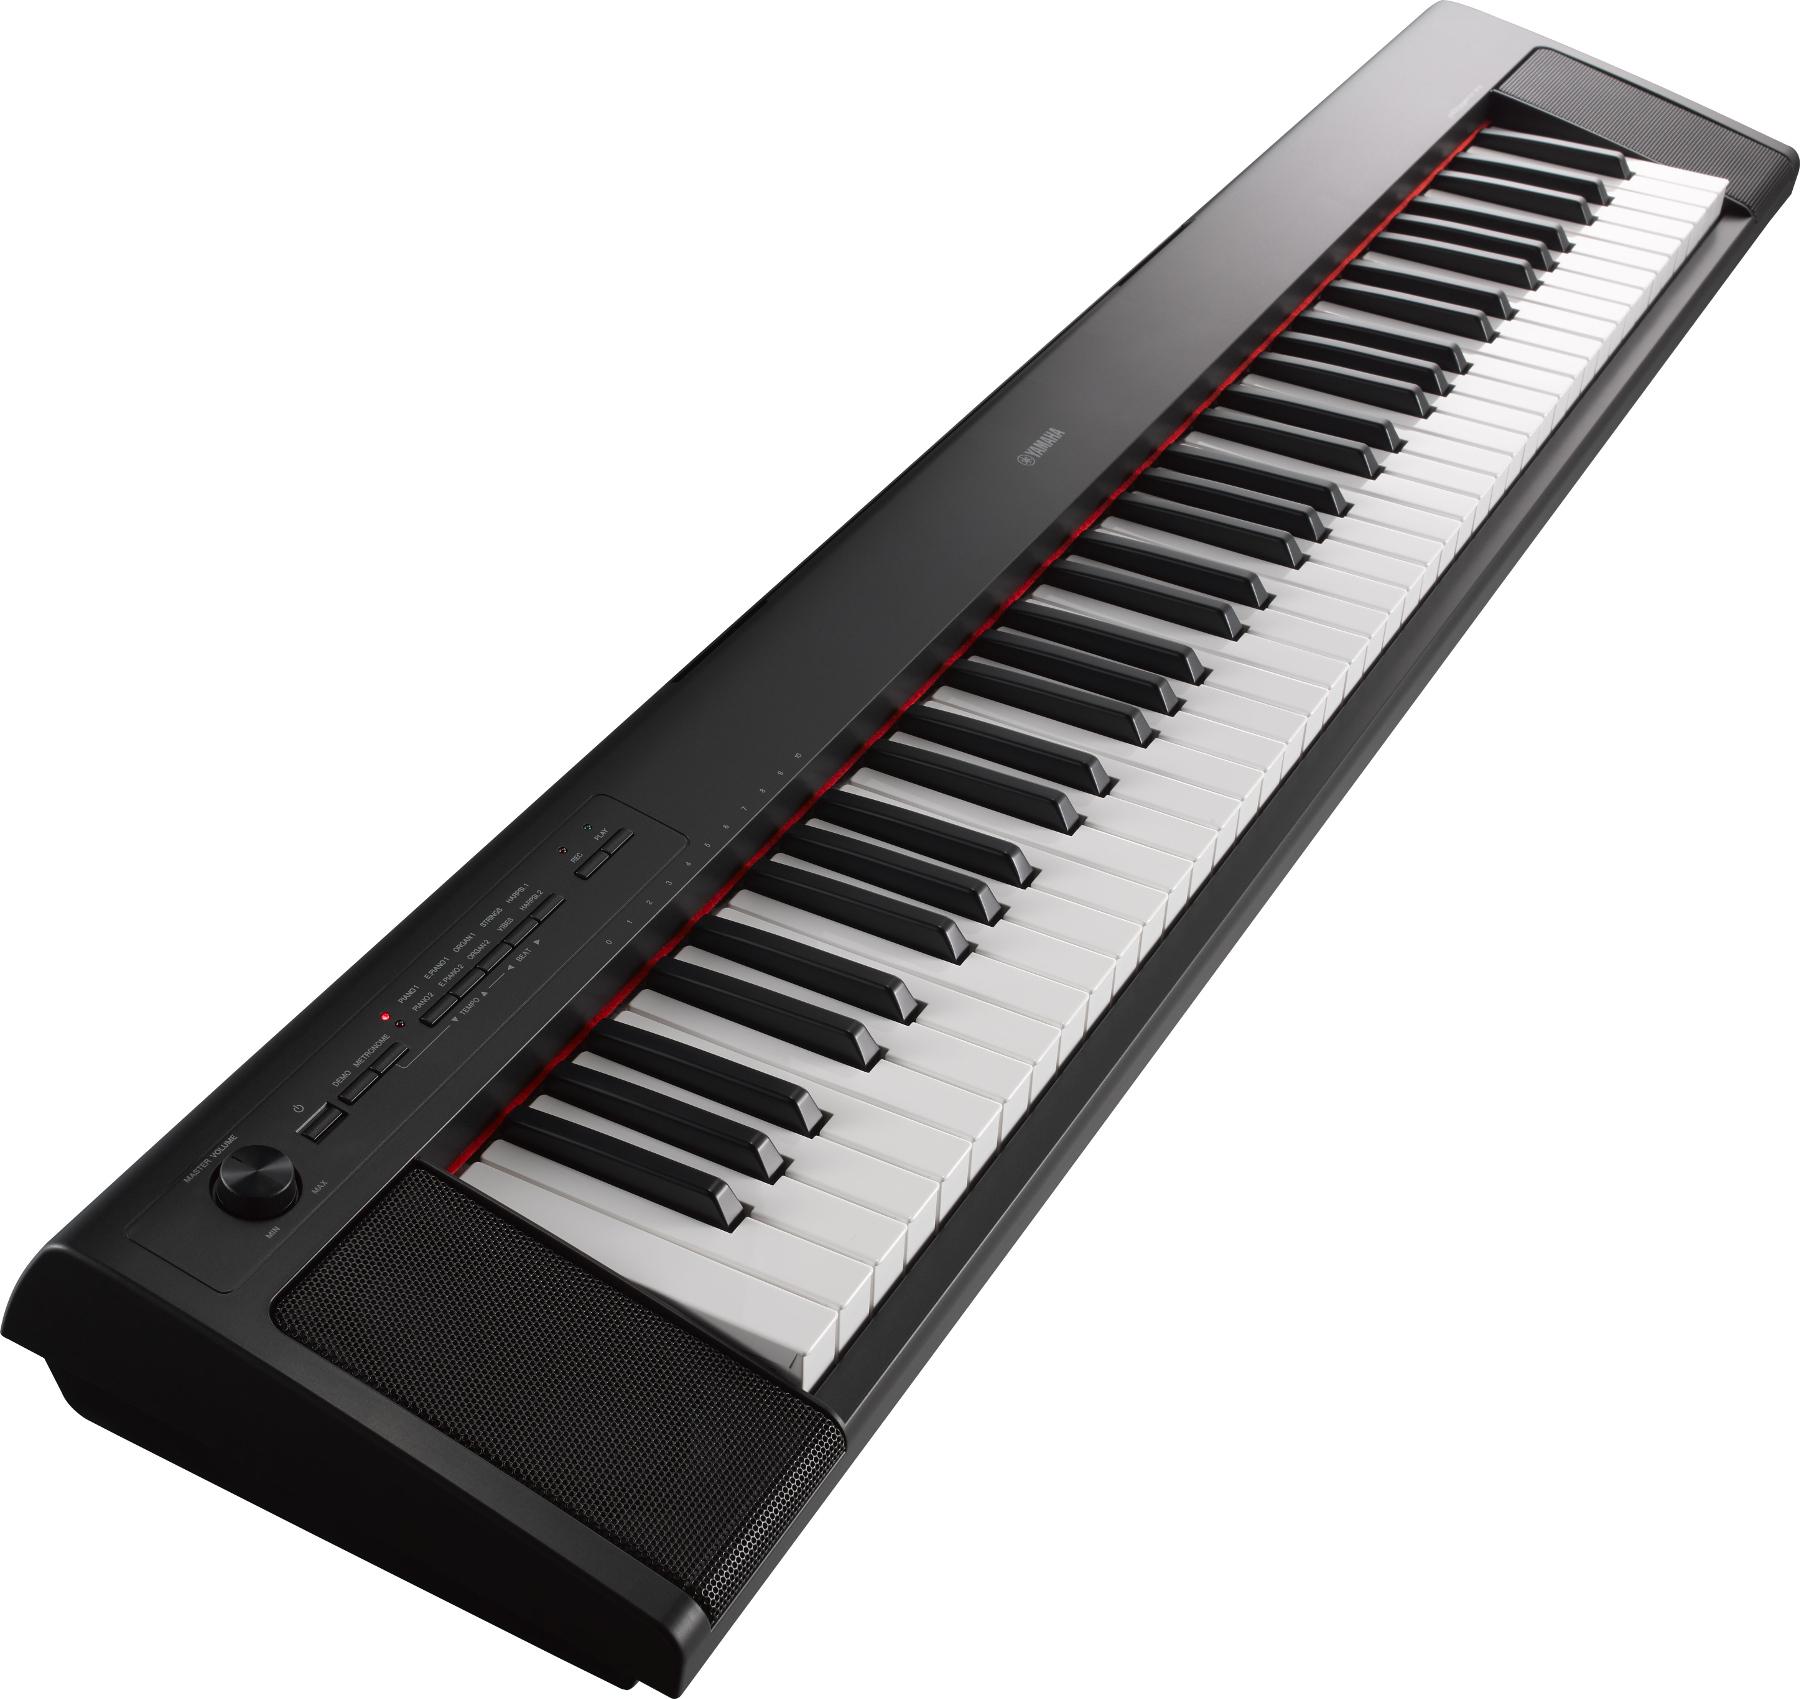 76-Key Piaggero Keyboard